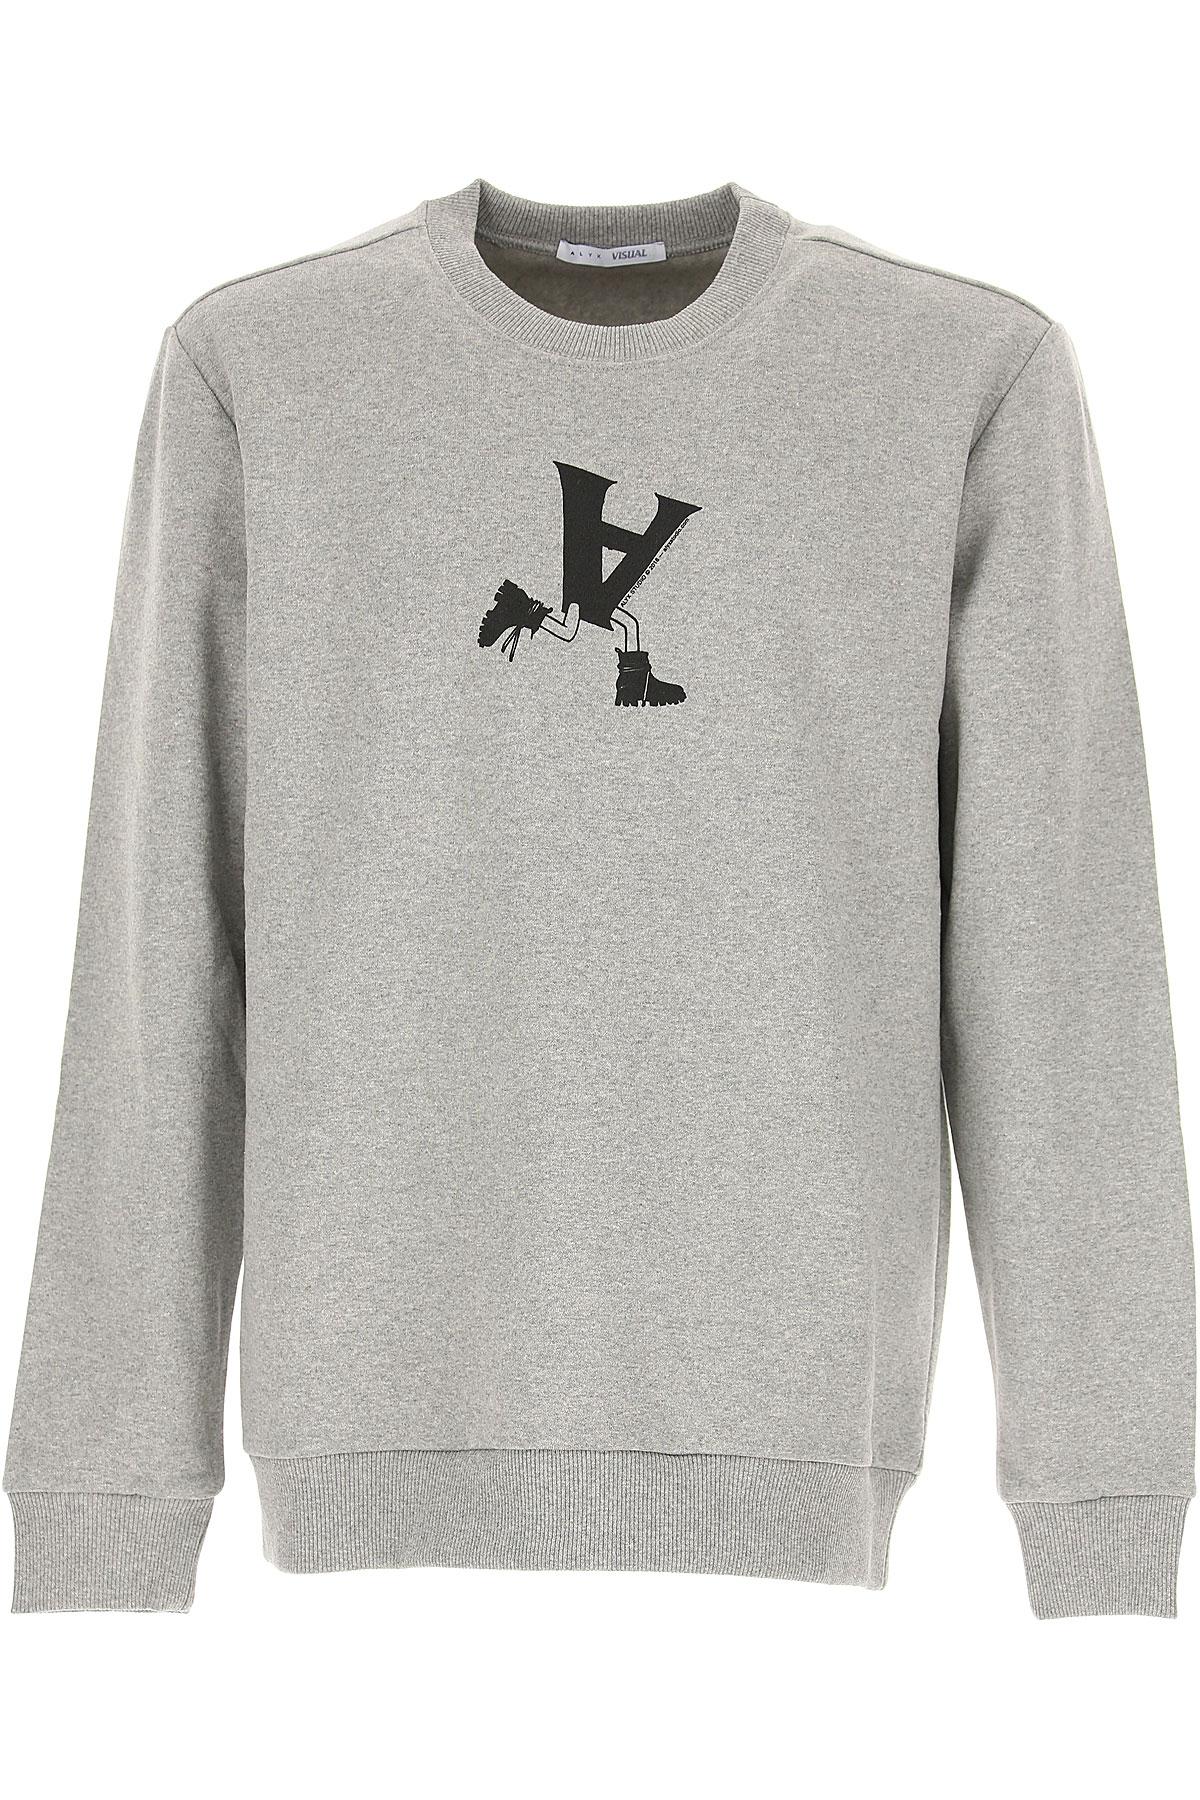 ALYX Sweatshirt for Men On Sale in Outlet, Grey Melange, Cotton, 2019, M S